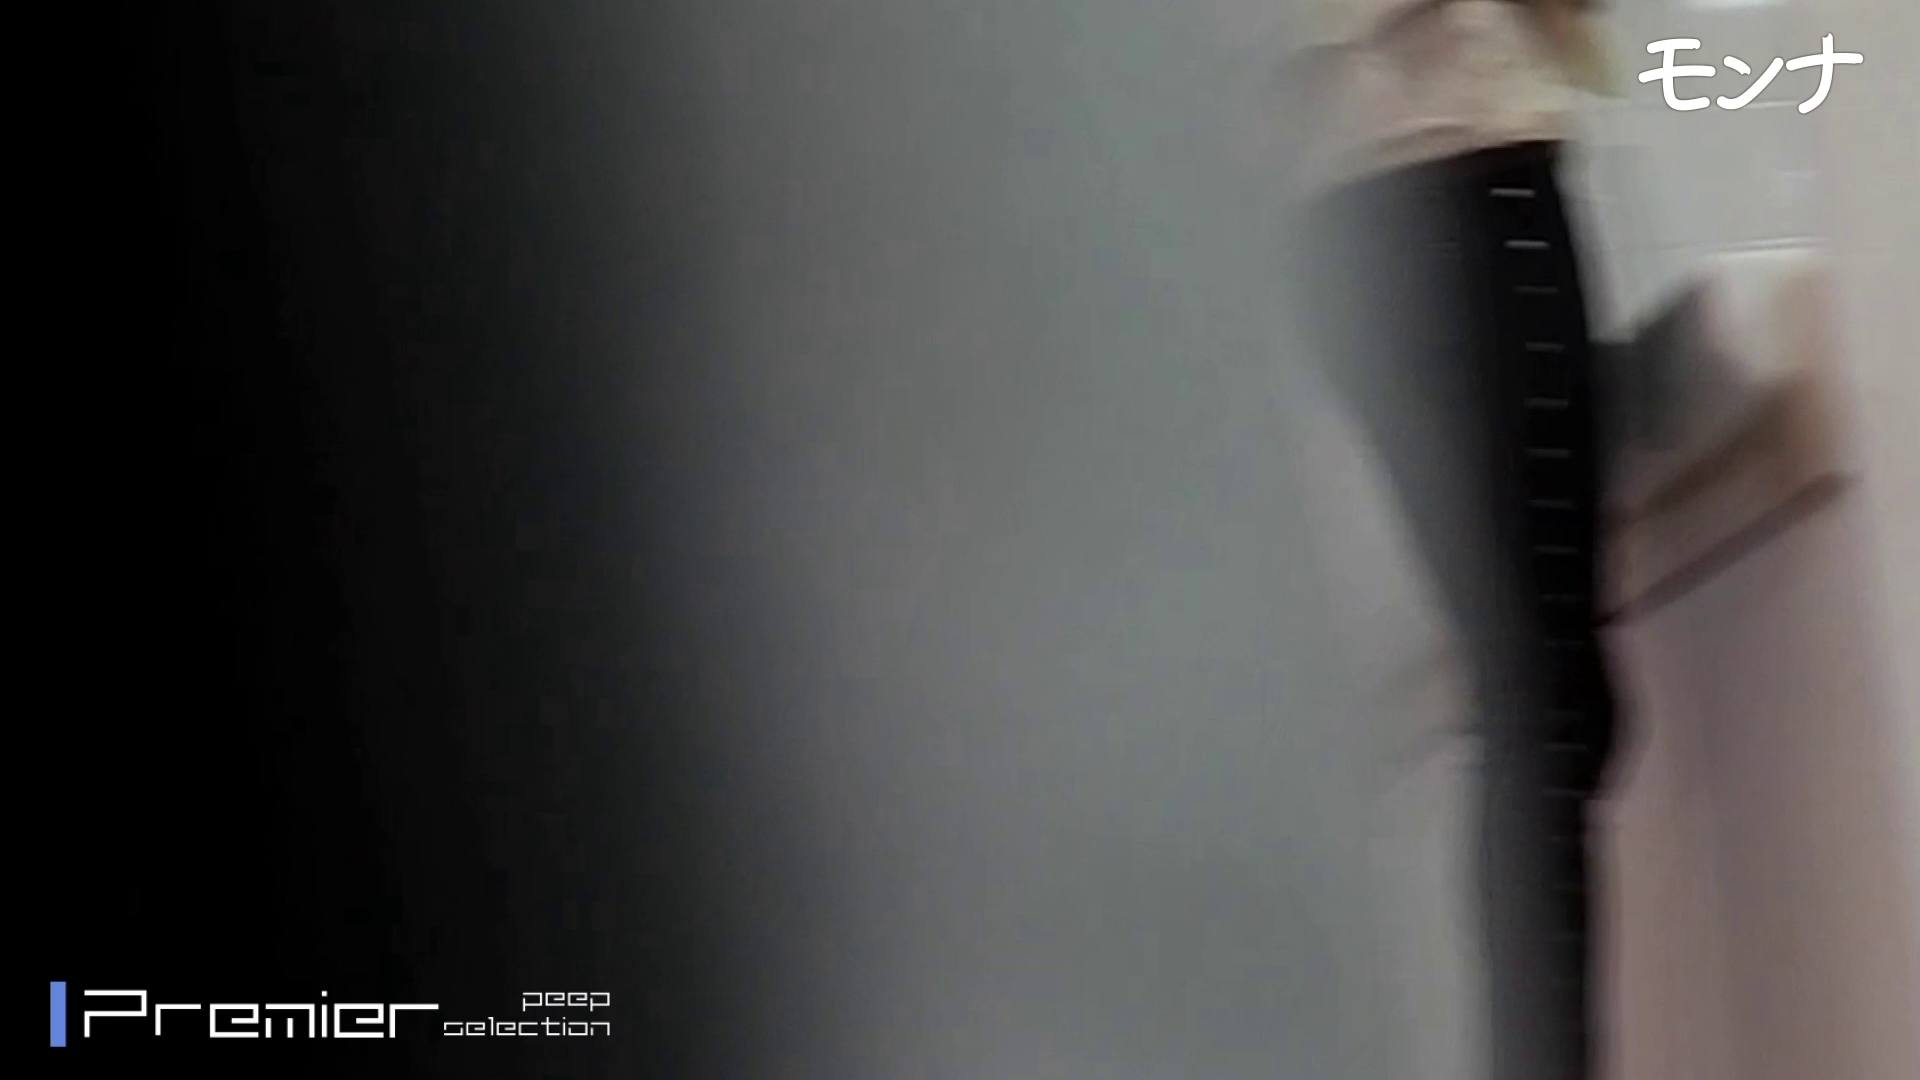 CM 悶絶シリーズ5 【美しい日本の未来 No.128】 洗面所のぞき オメコ動画キャプチャ 111枚 107